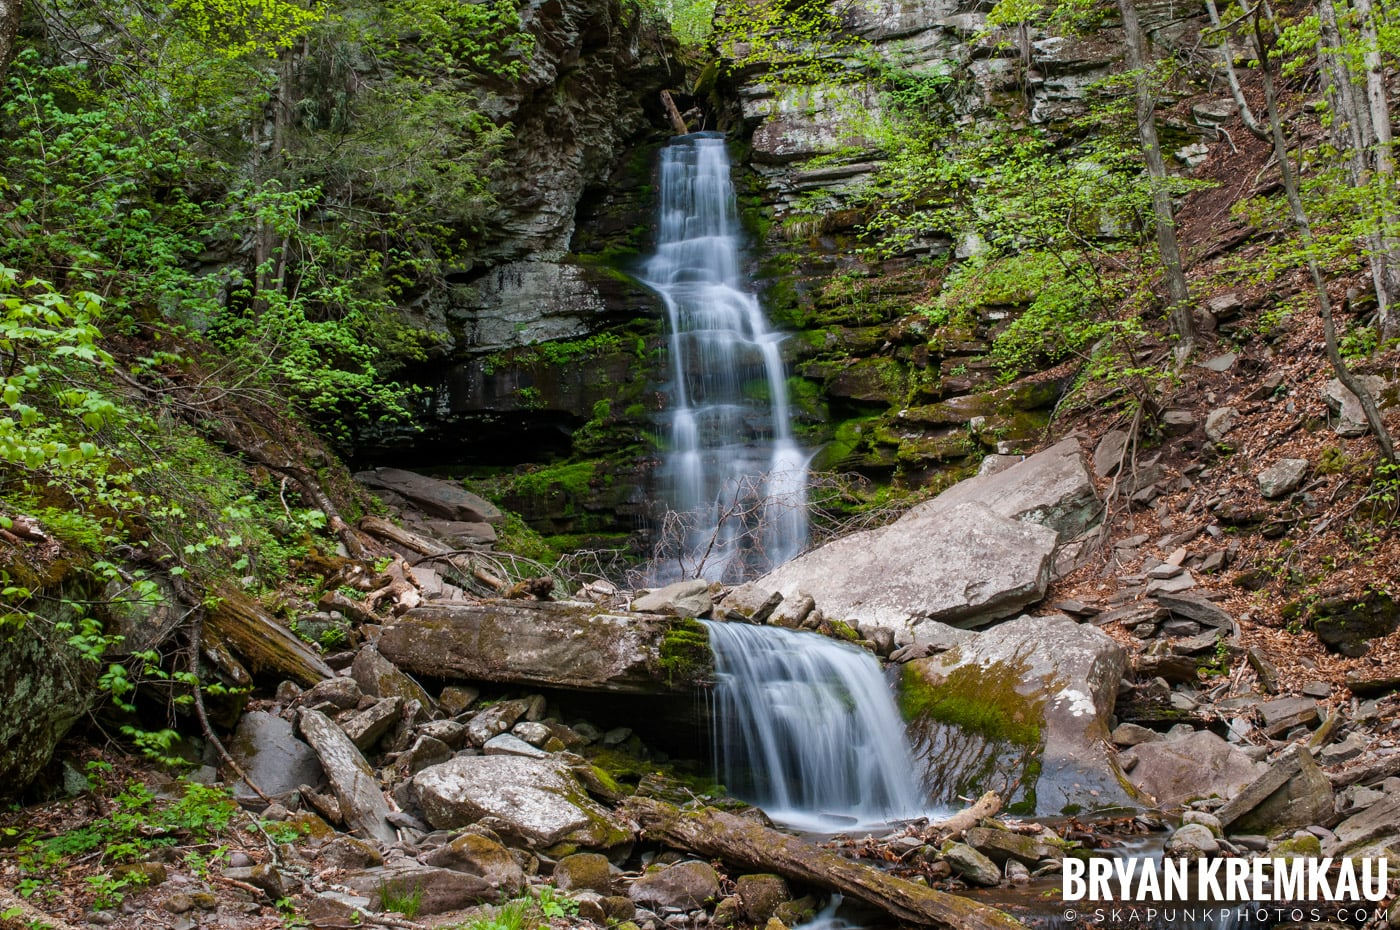 Getting Engaged @ Peekamoose Waterfall, Sundown NY - 5.1.10 (24)